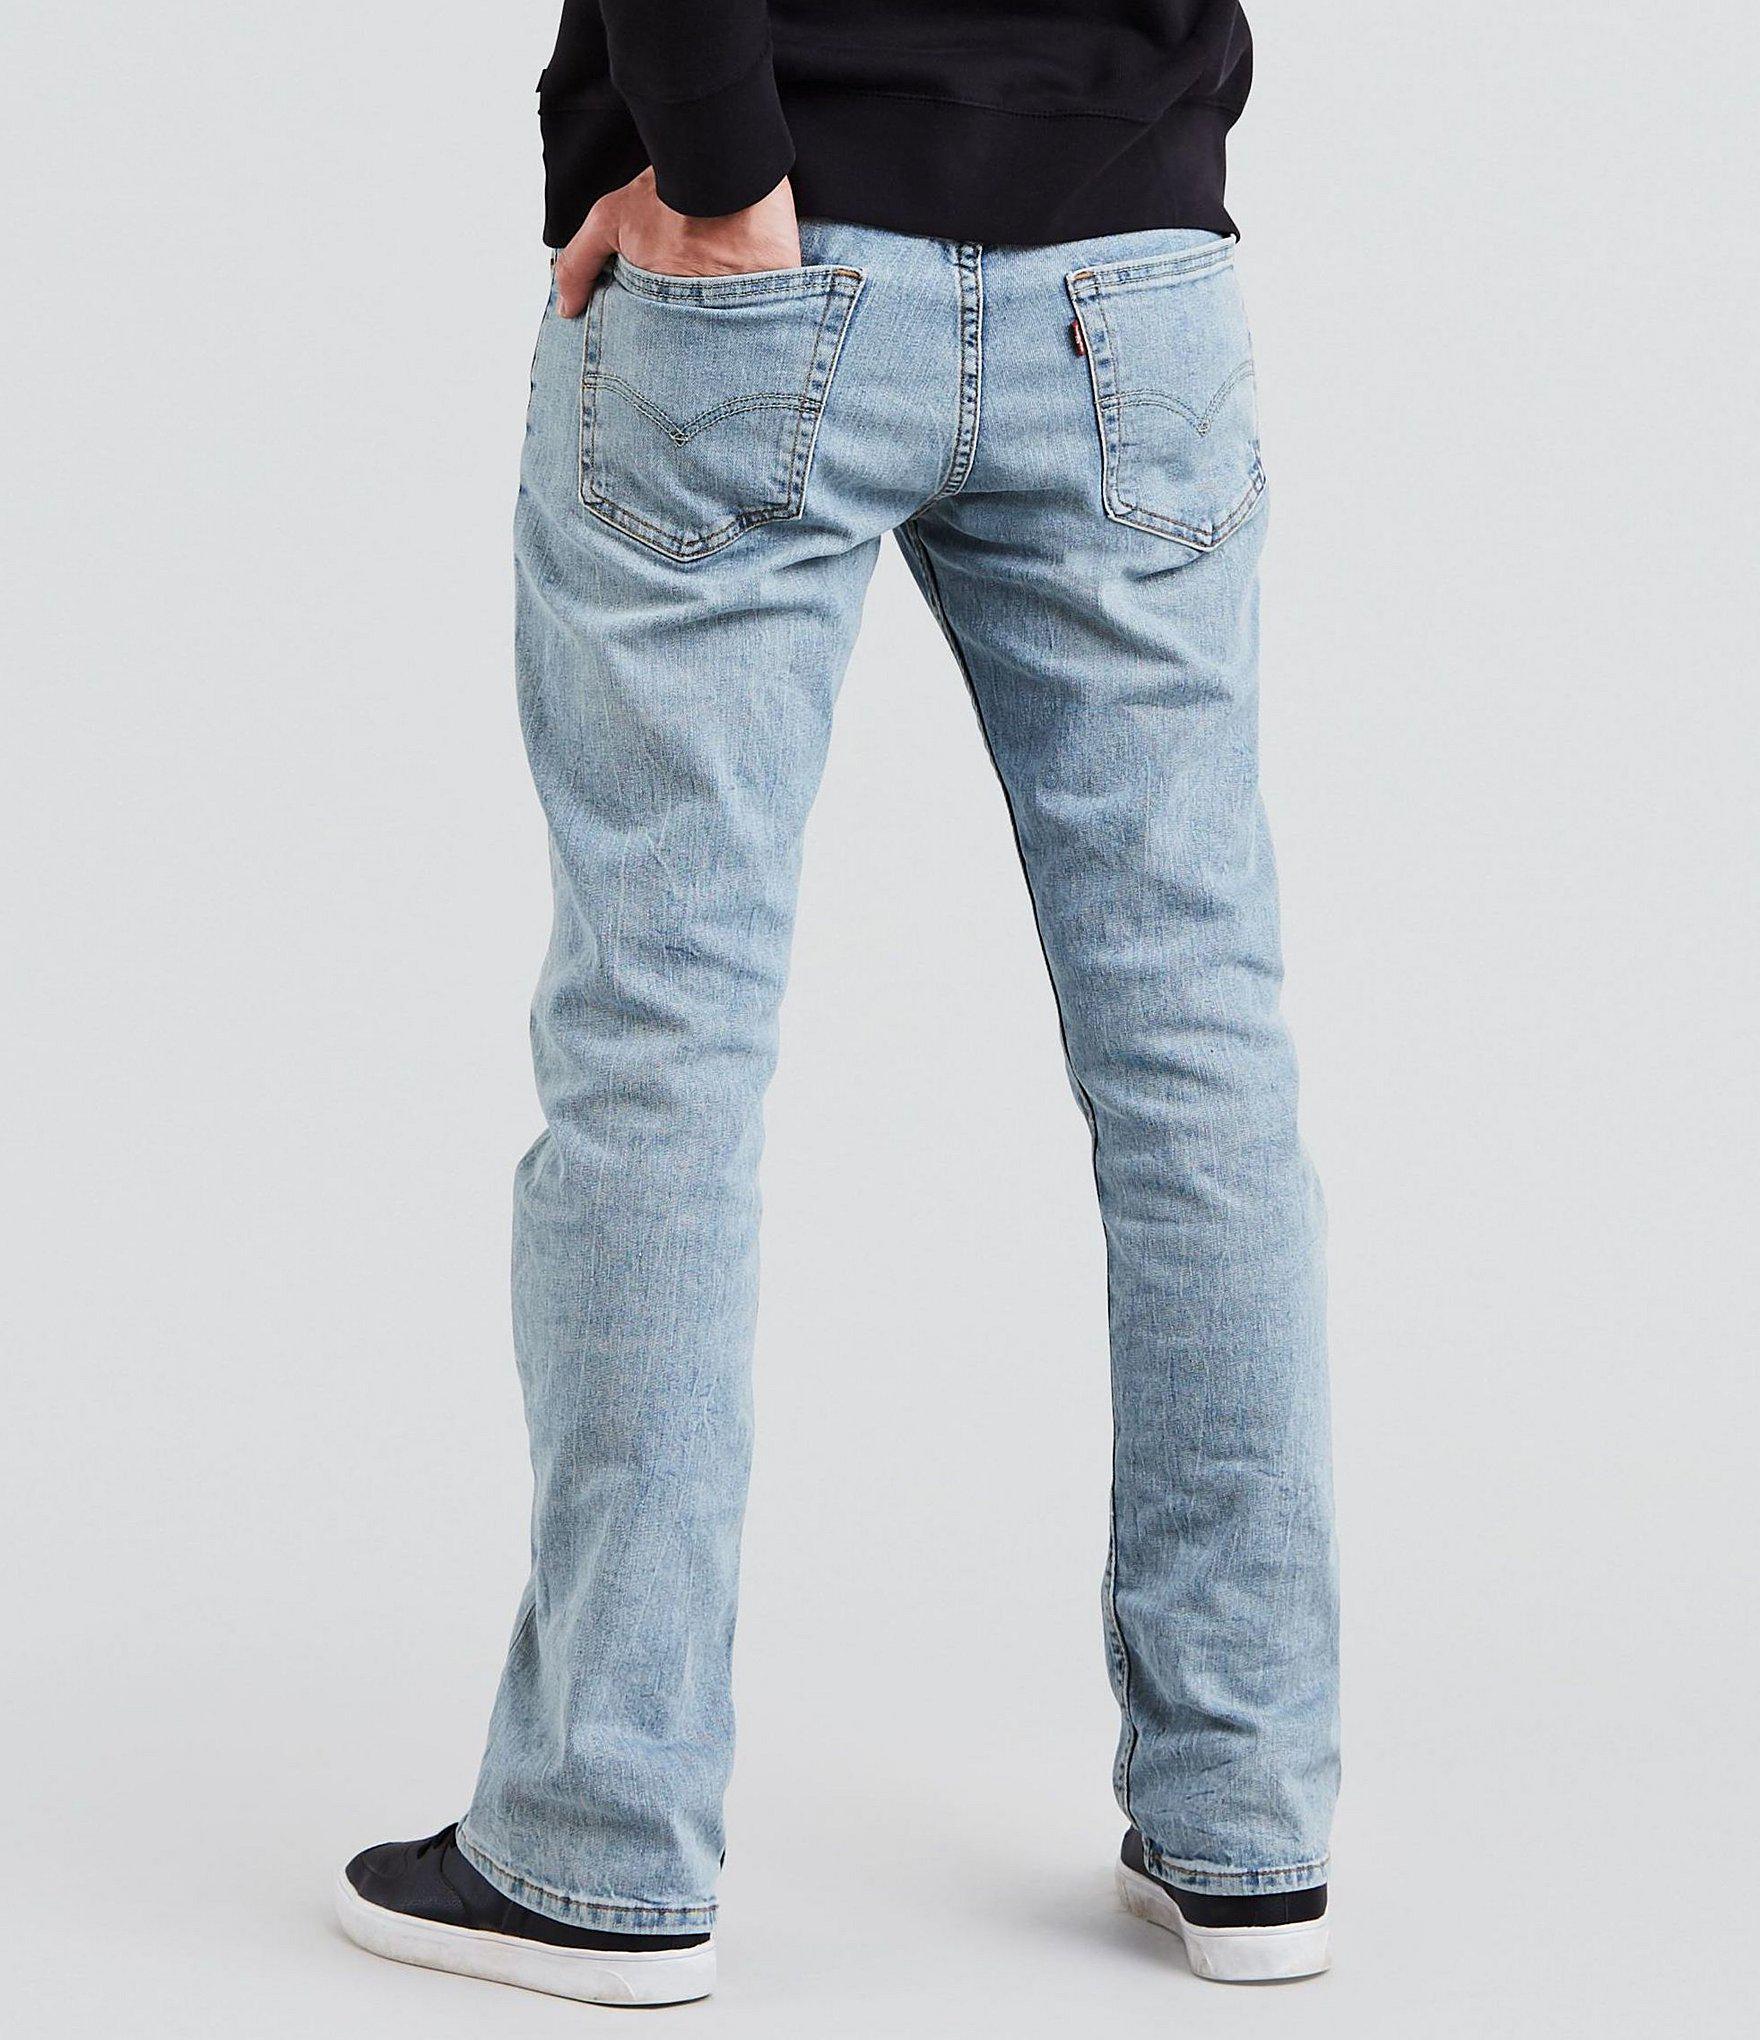 5abbaf858f Levi s - 527 Blue Stone Wash Slim Bootcut Jeans for Men - Lyst. View  fullscreen